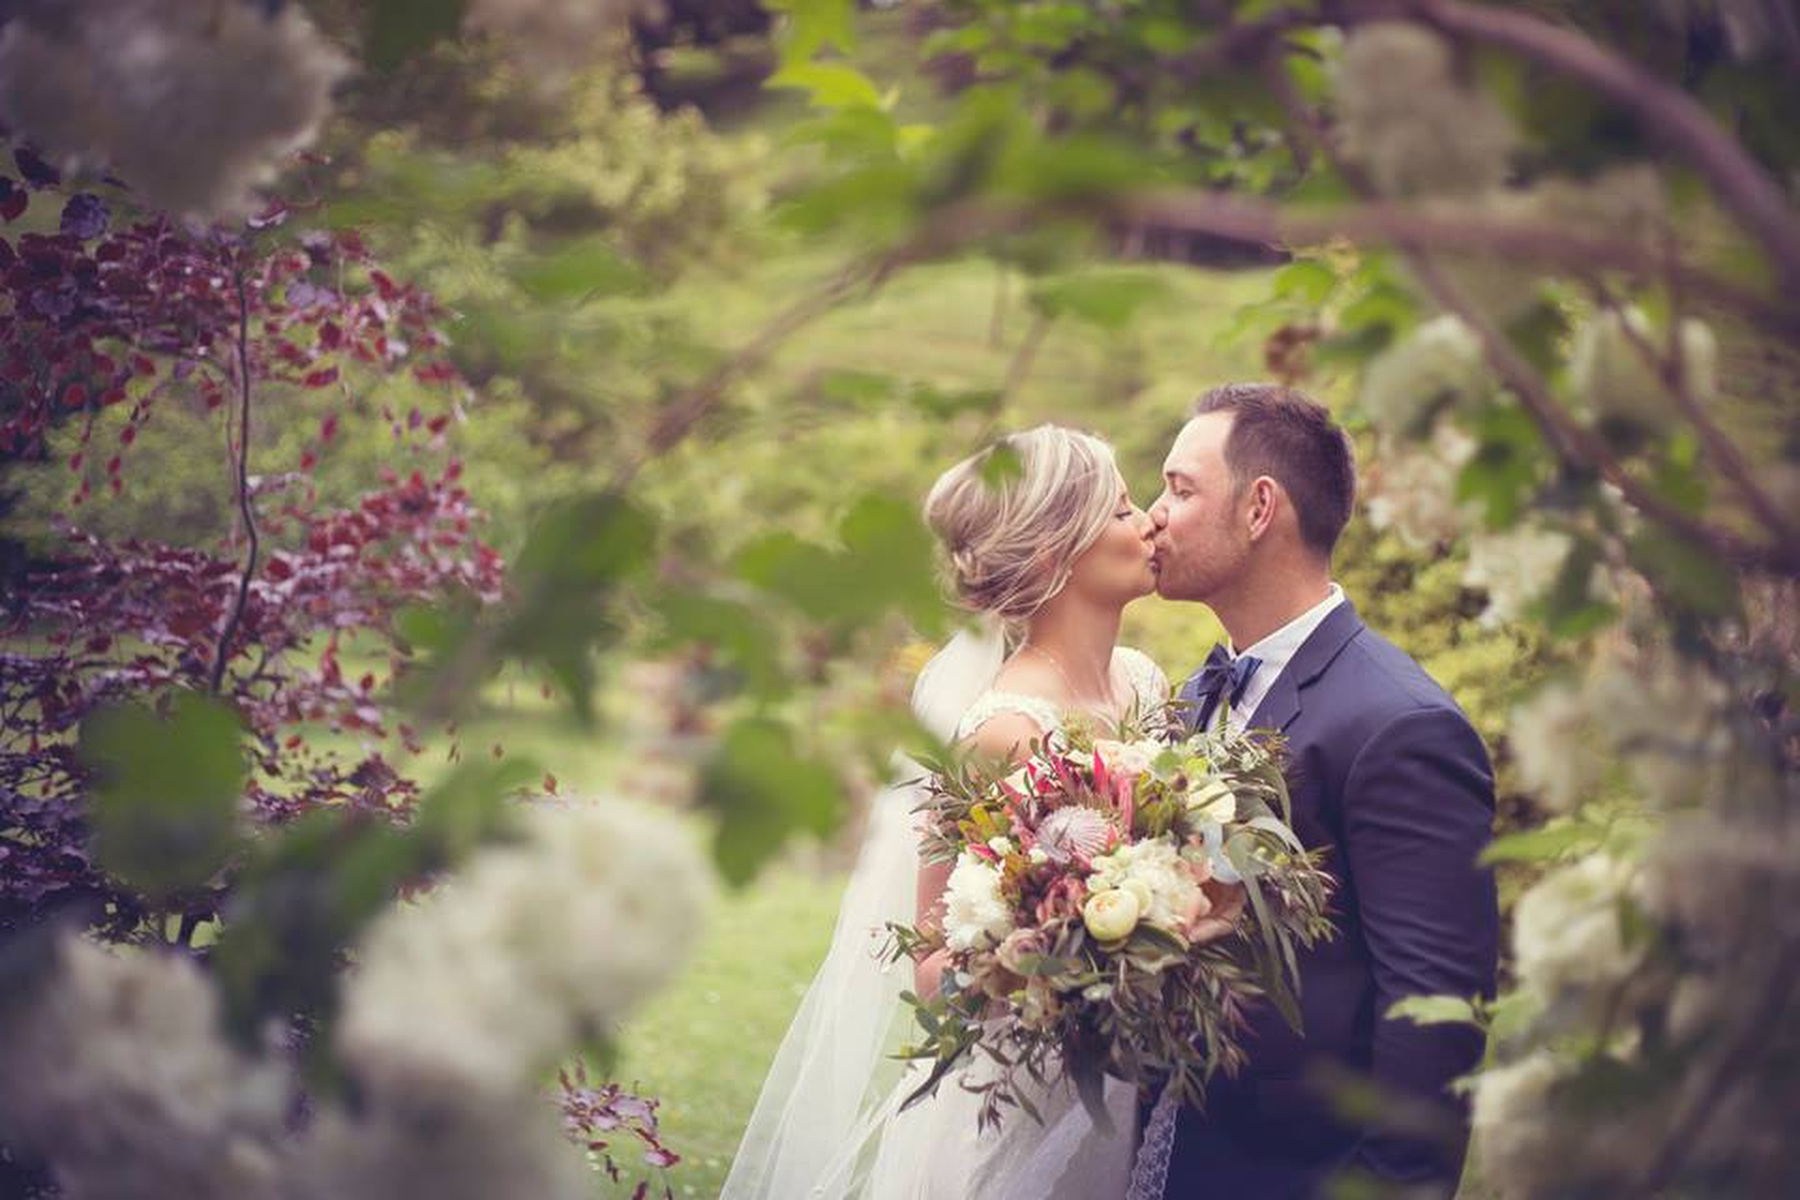 wedding-photogrpaher-kapiti-michelle-12A.JPG